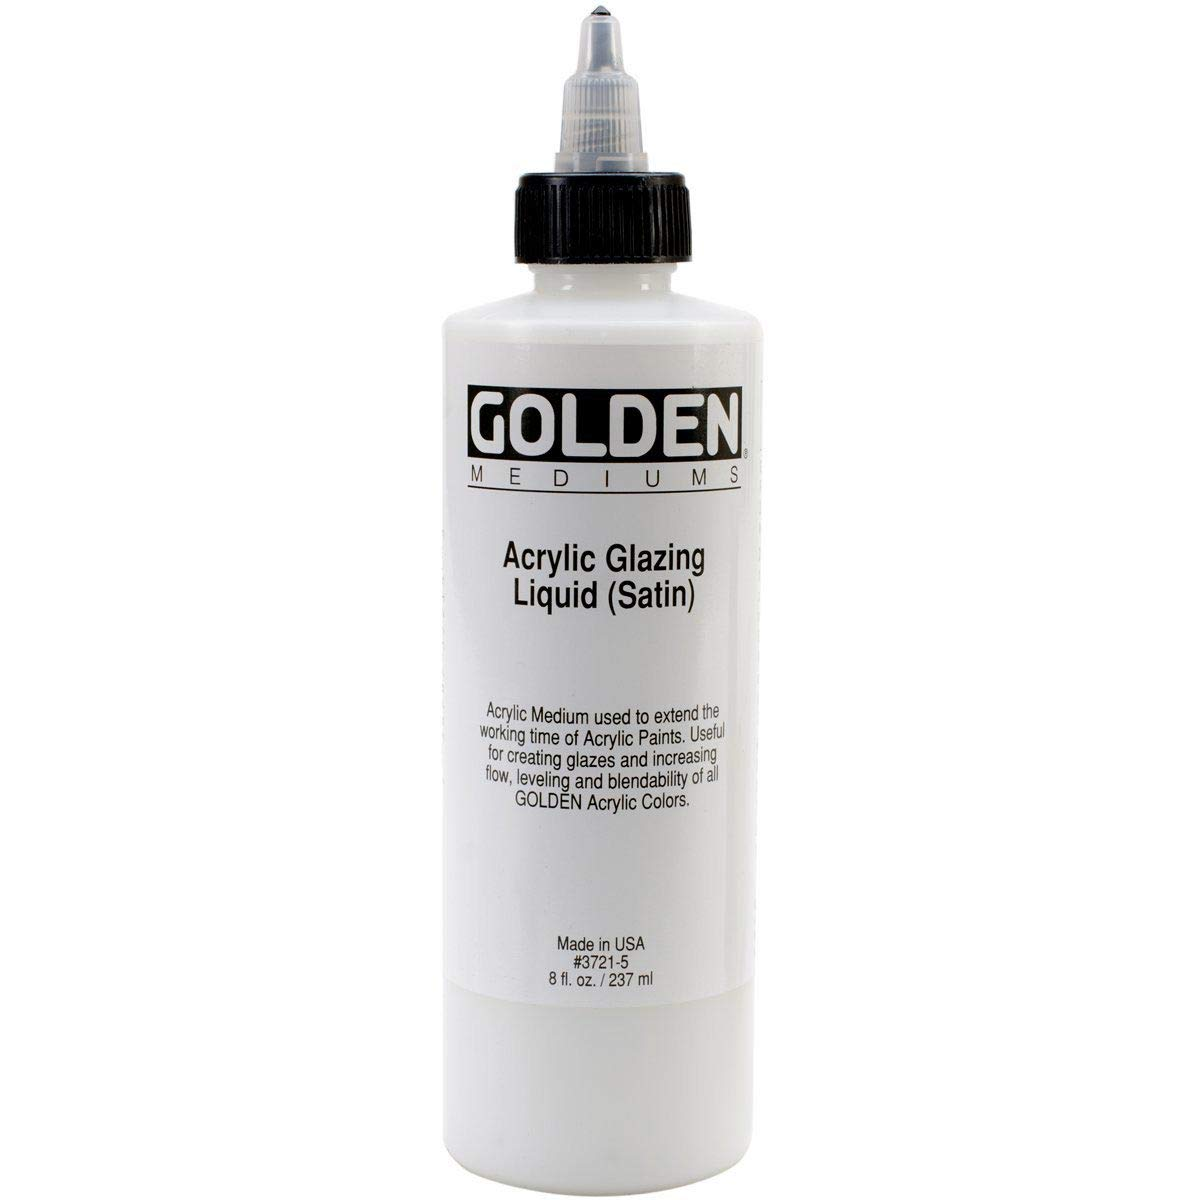 Golden Acryl Med 16 Oz Glaze Liquid Satin